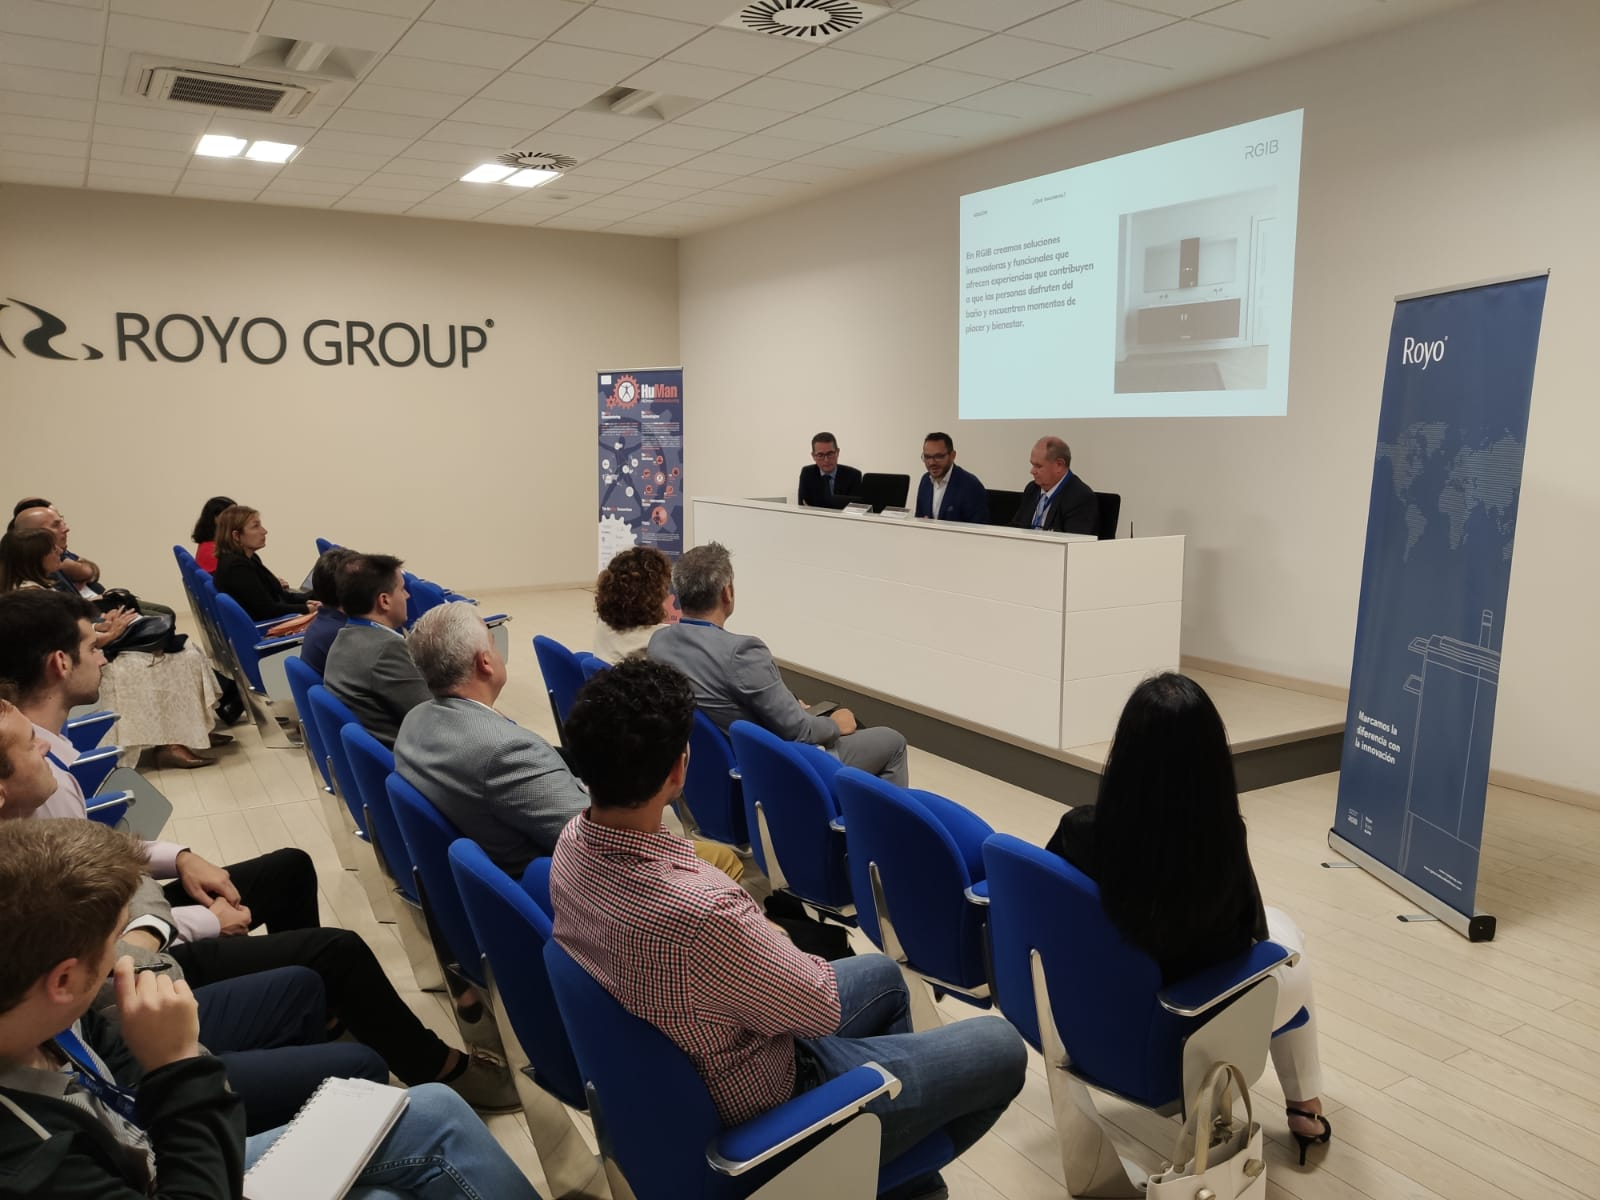 Upper management presenting